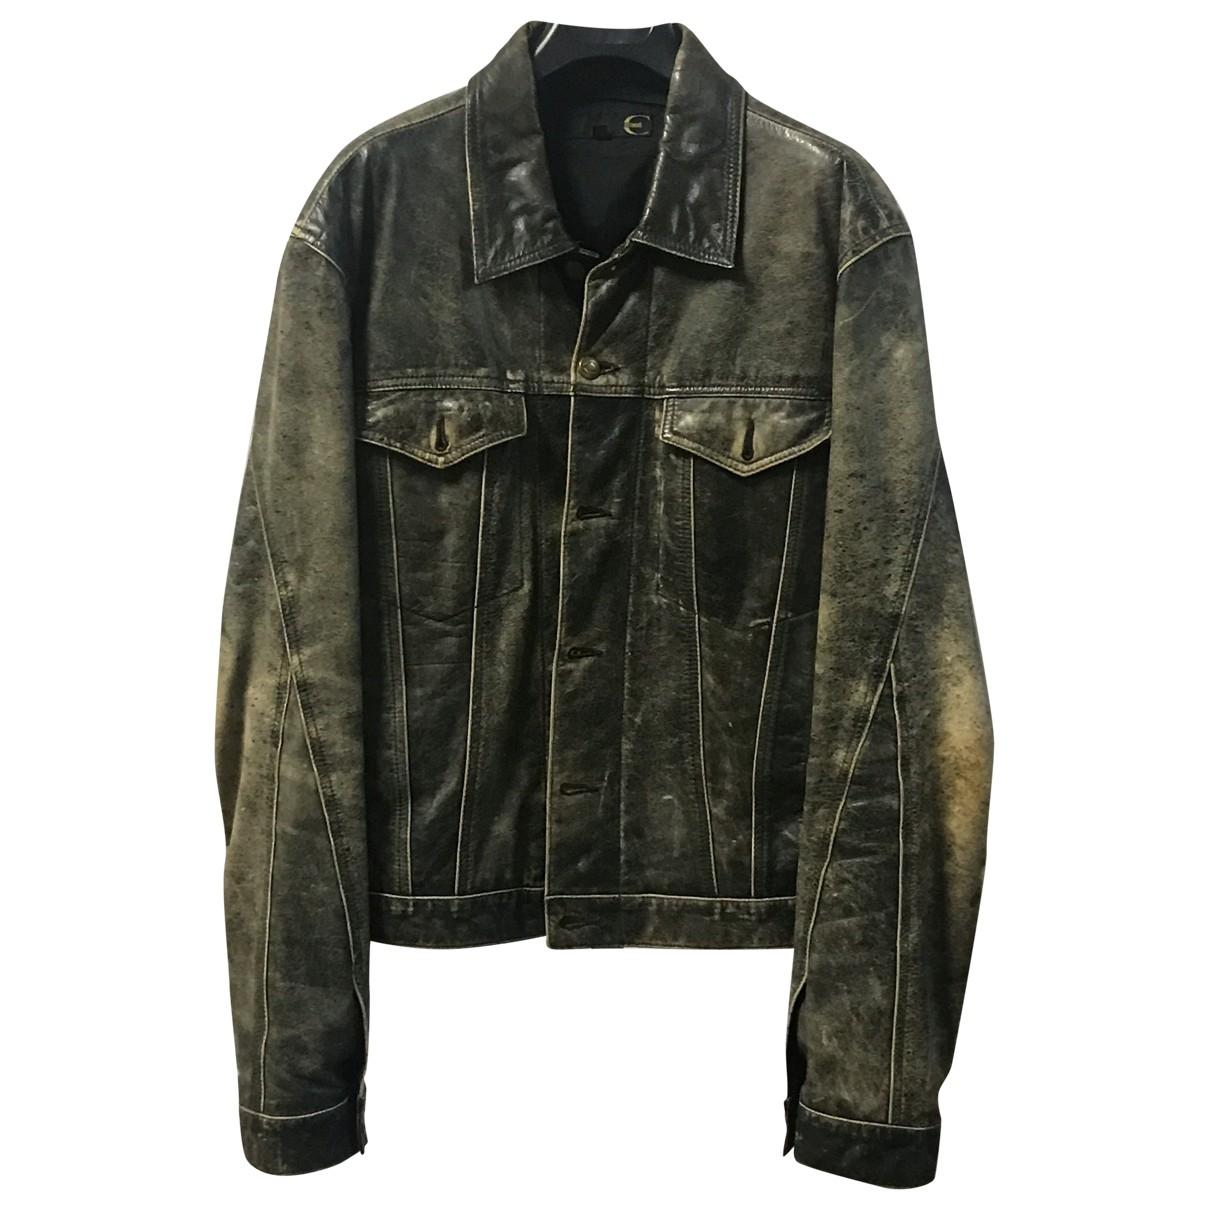 Just Cavalli \N Brown Leather jacket  for Men L International